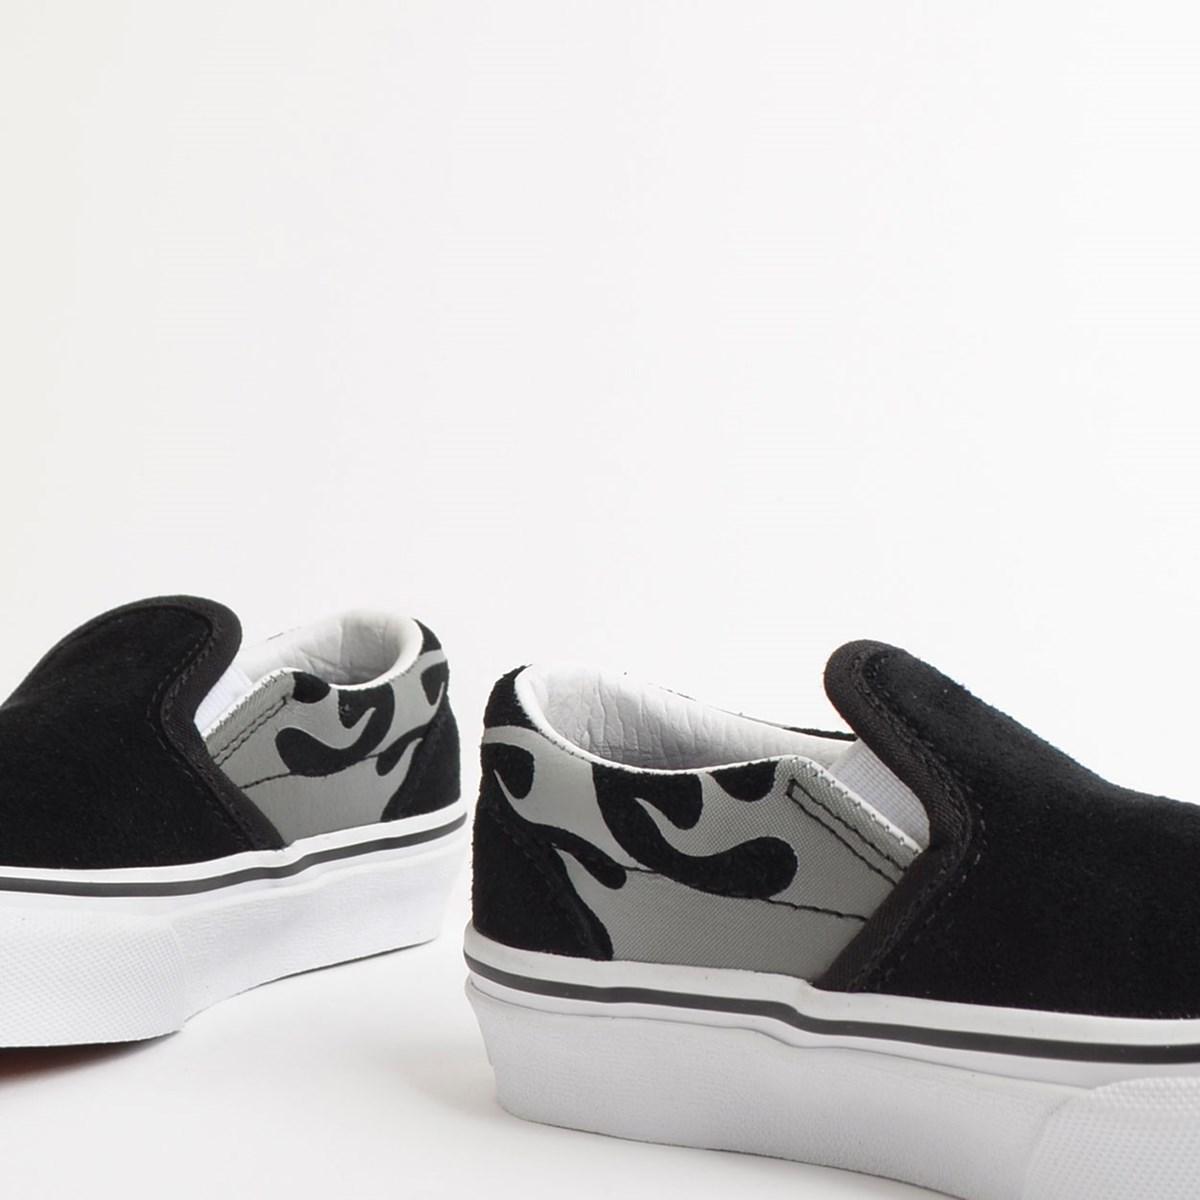 Tênis Vans Kids Classic Slip On Suede Flame Black True White VN0A4BUTWKJ